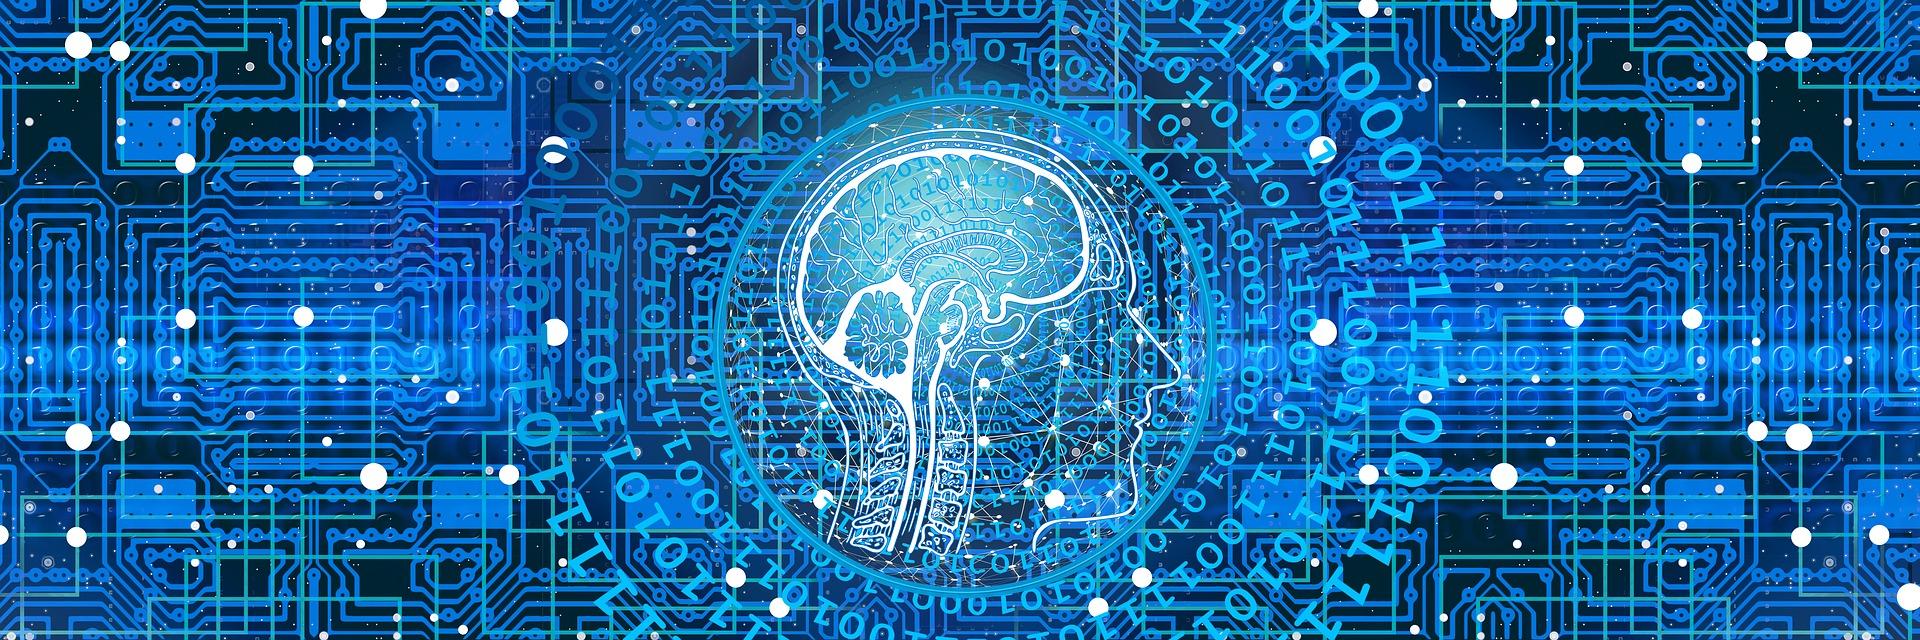 人工知能/計算知能 Artificial/Computational Intelligence